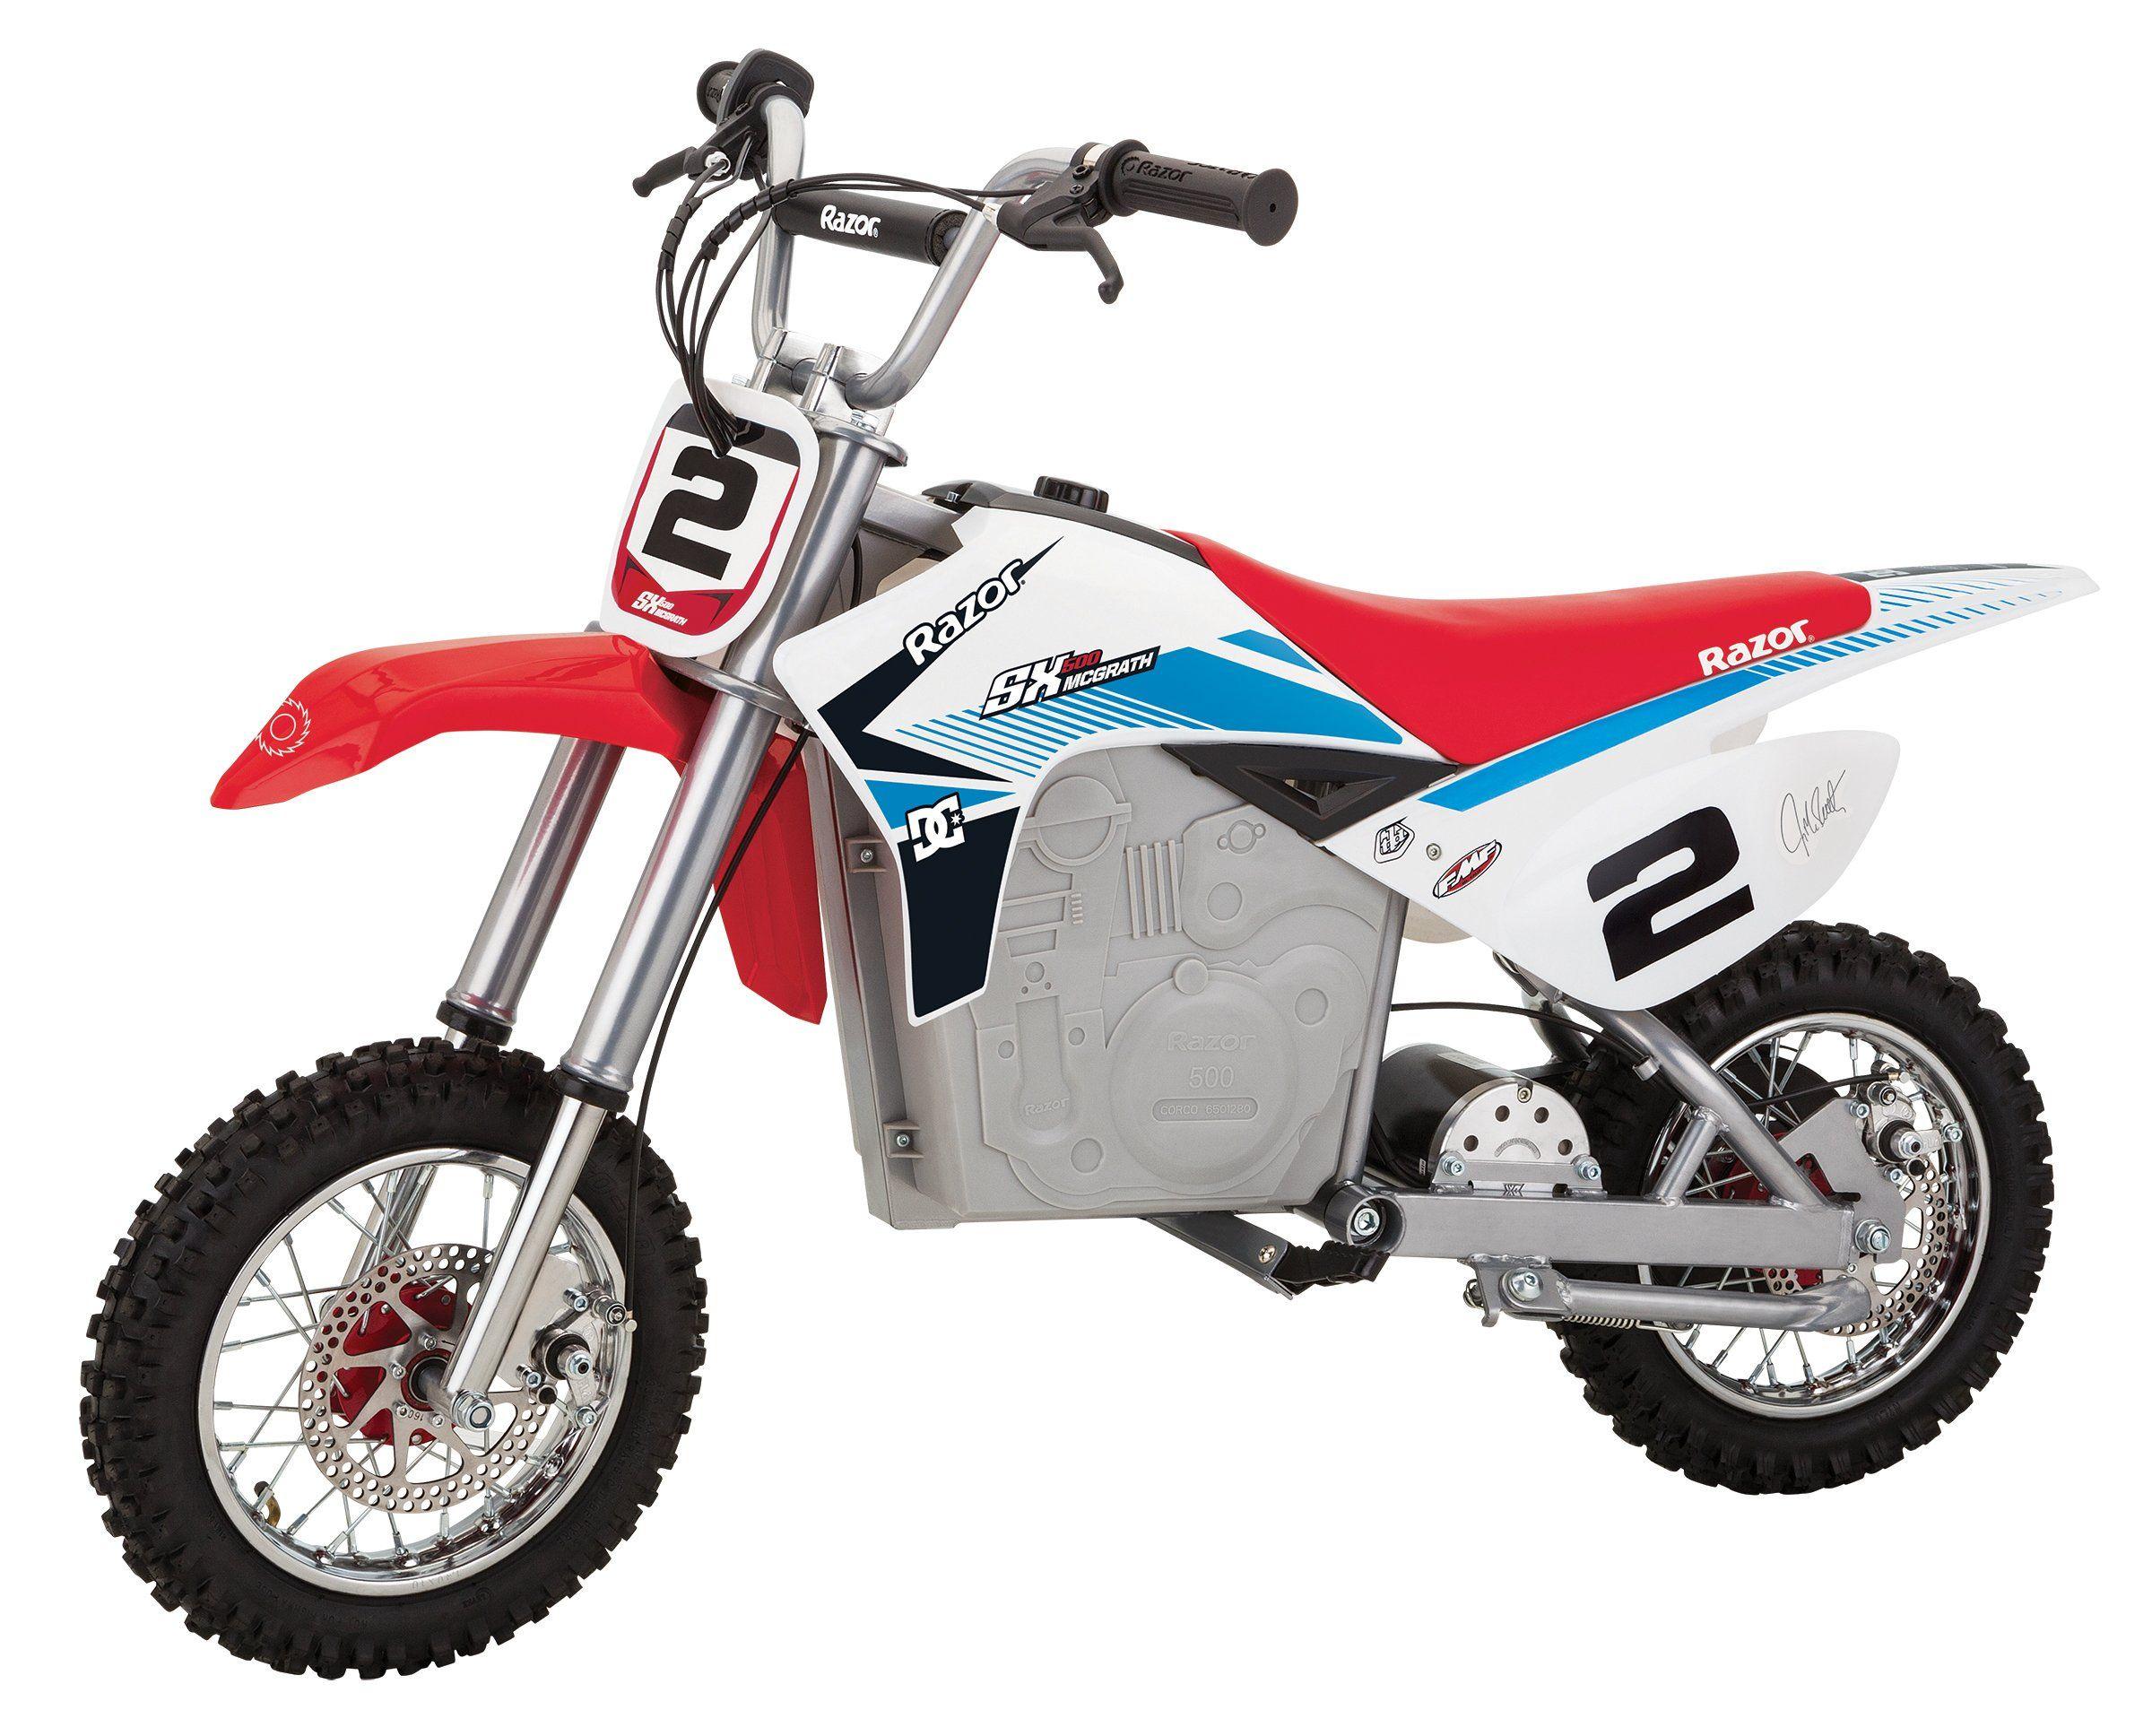 Advertisement Ebay Razor Mx350 24 Volt Dirt Rocket Electric Motocross Bike Black Distressed Packa Motocross Bikes Motocross Bike Experience